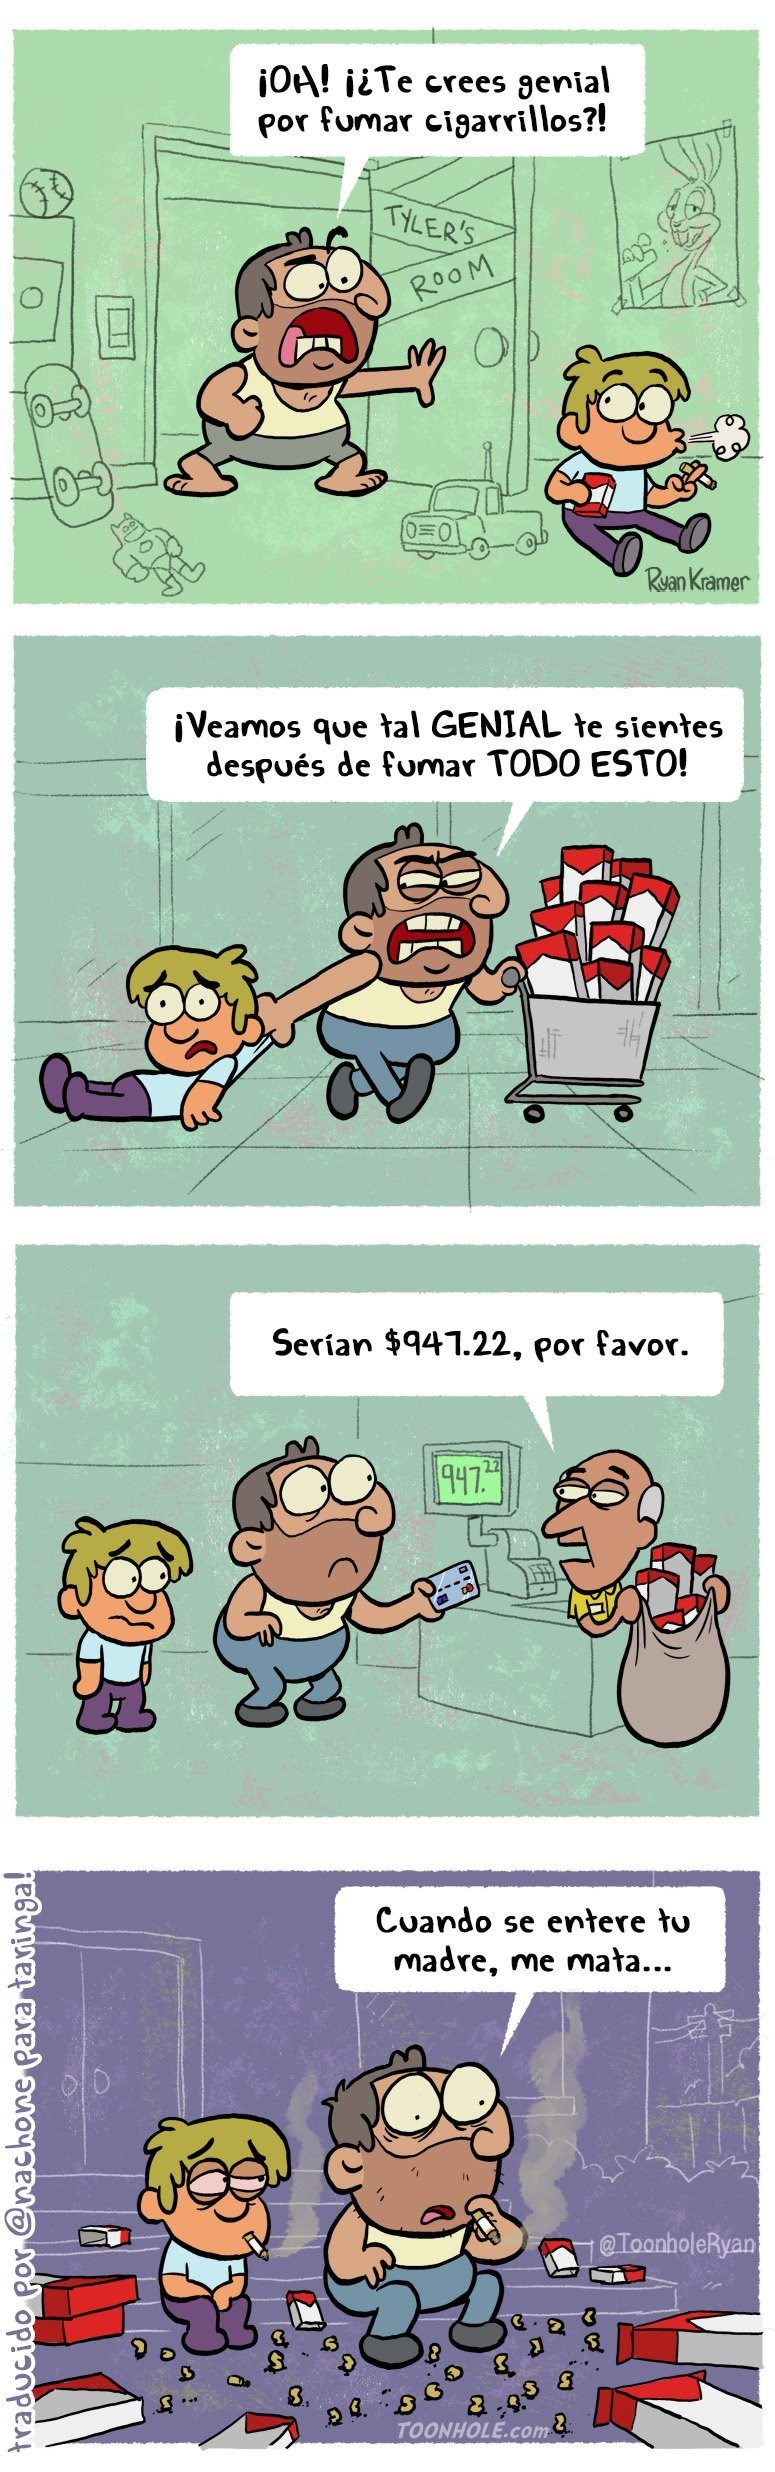 cuando tu leccion sale muy costosa